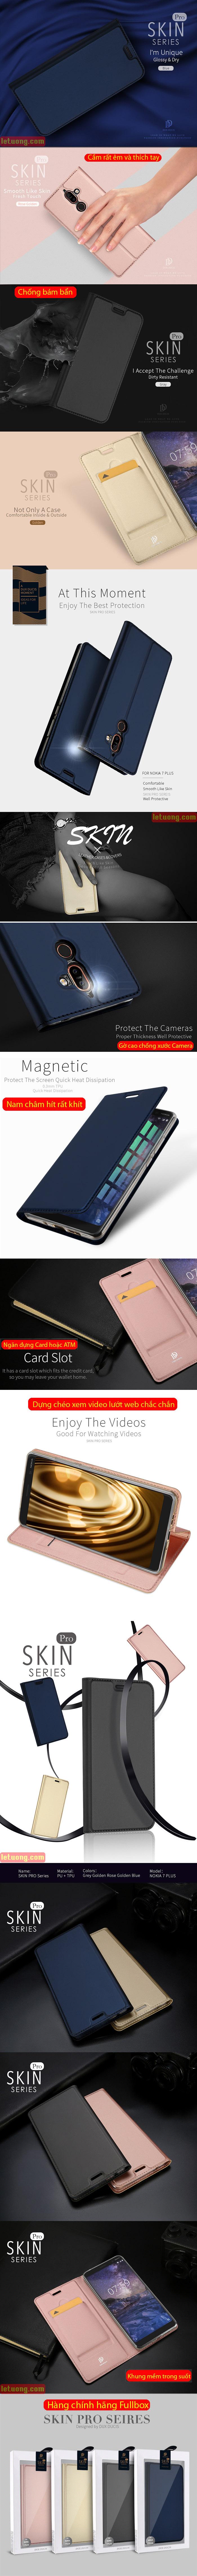 Bao da Nokia 7 Plus Dux Ducis Skin khung mềm - siêu mỏng 4